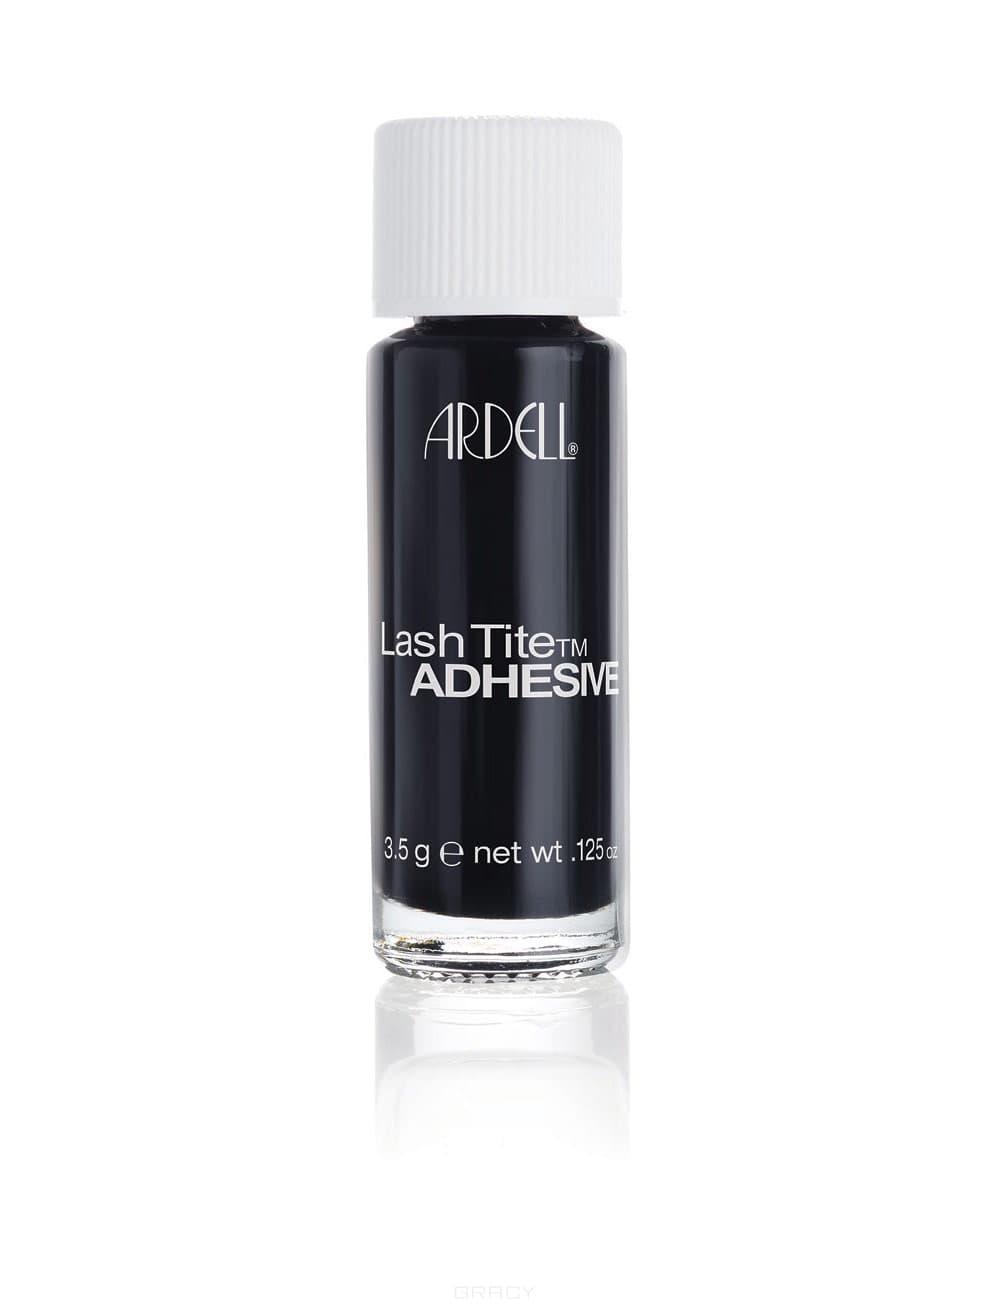 Ardell Lashtite Adhesive Dark Клей для пучков темный, 22 гр клей для ресниц темный lashgrip adhesive ardell